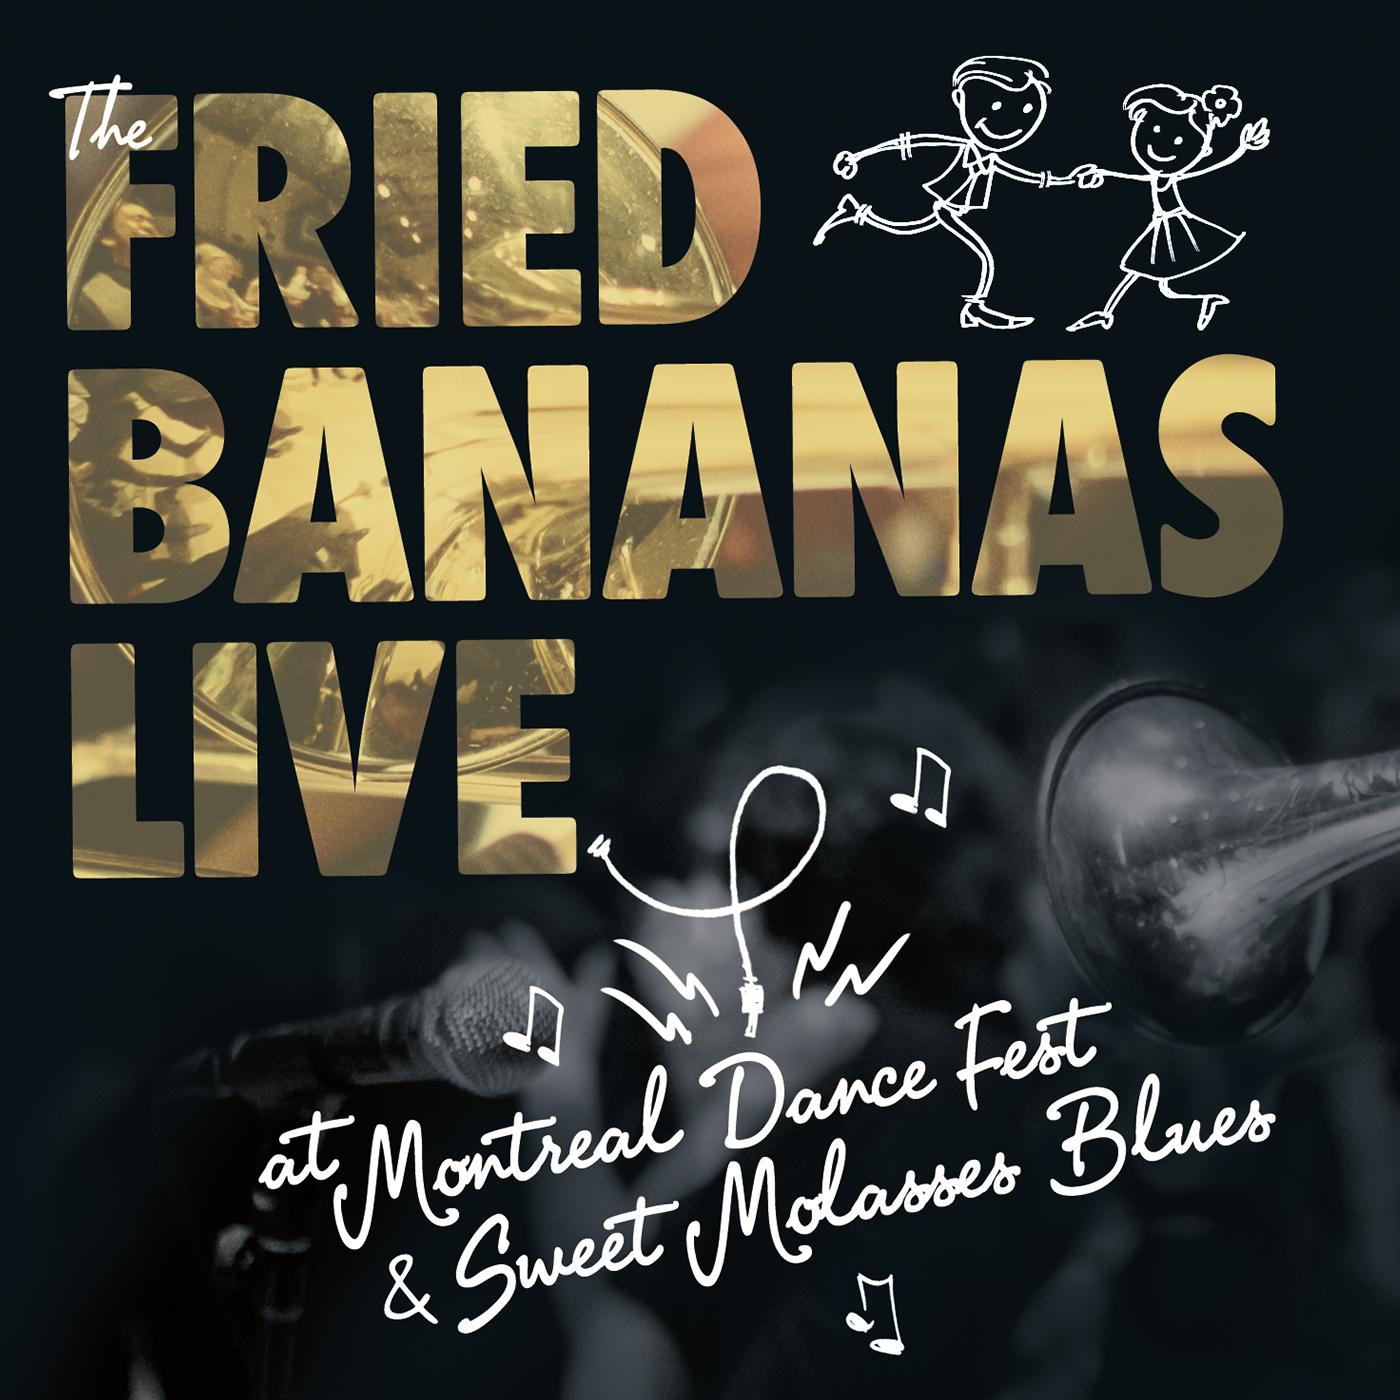 FRIED BANANAS CD COVER